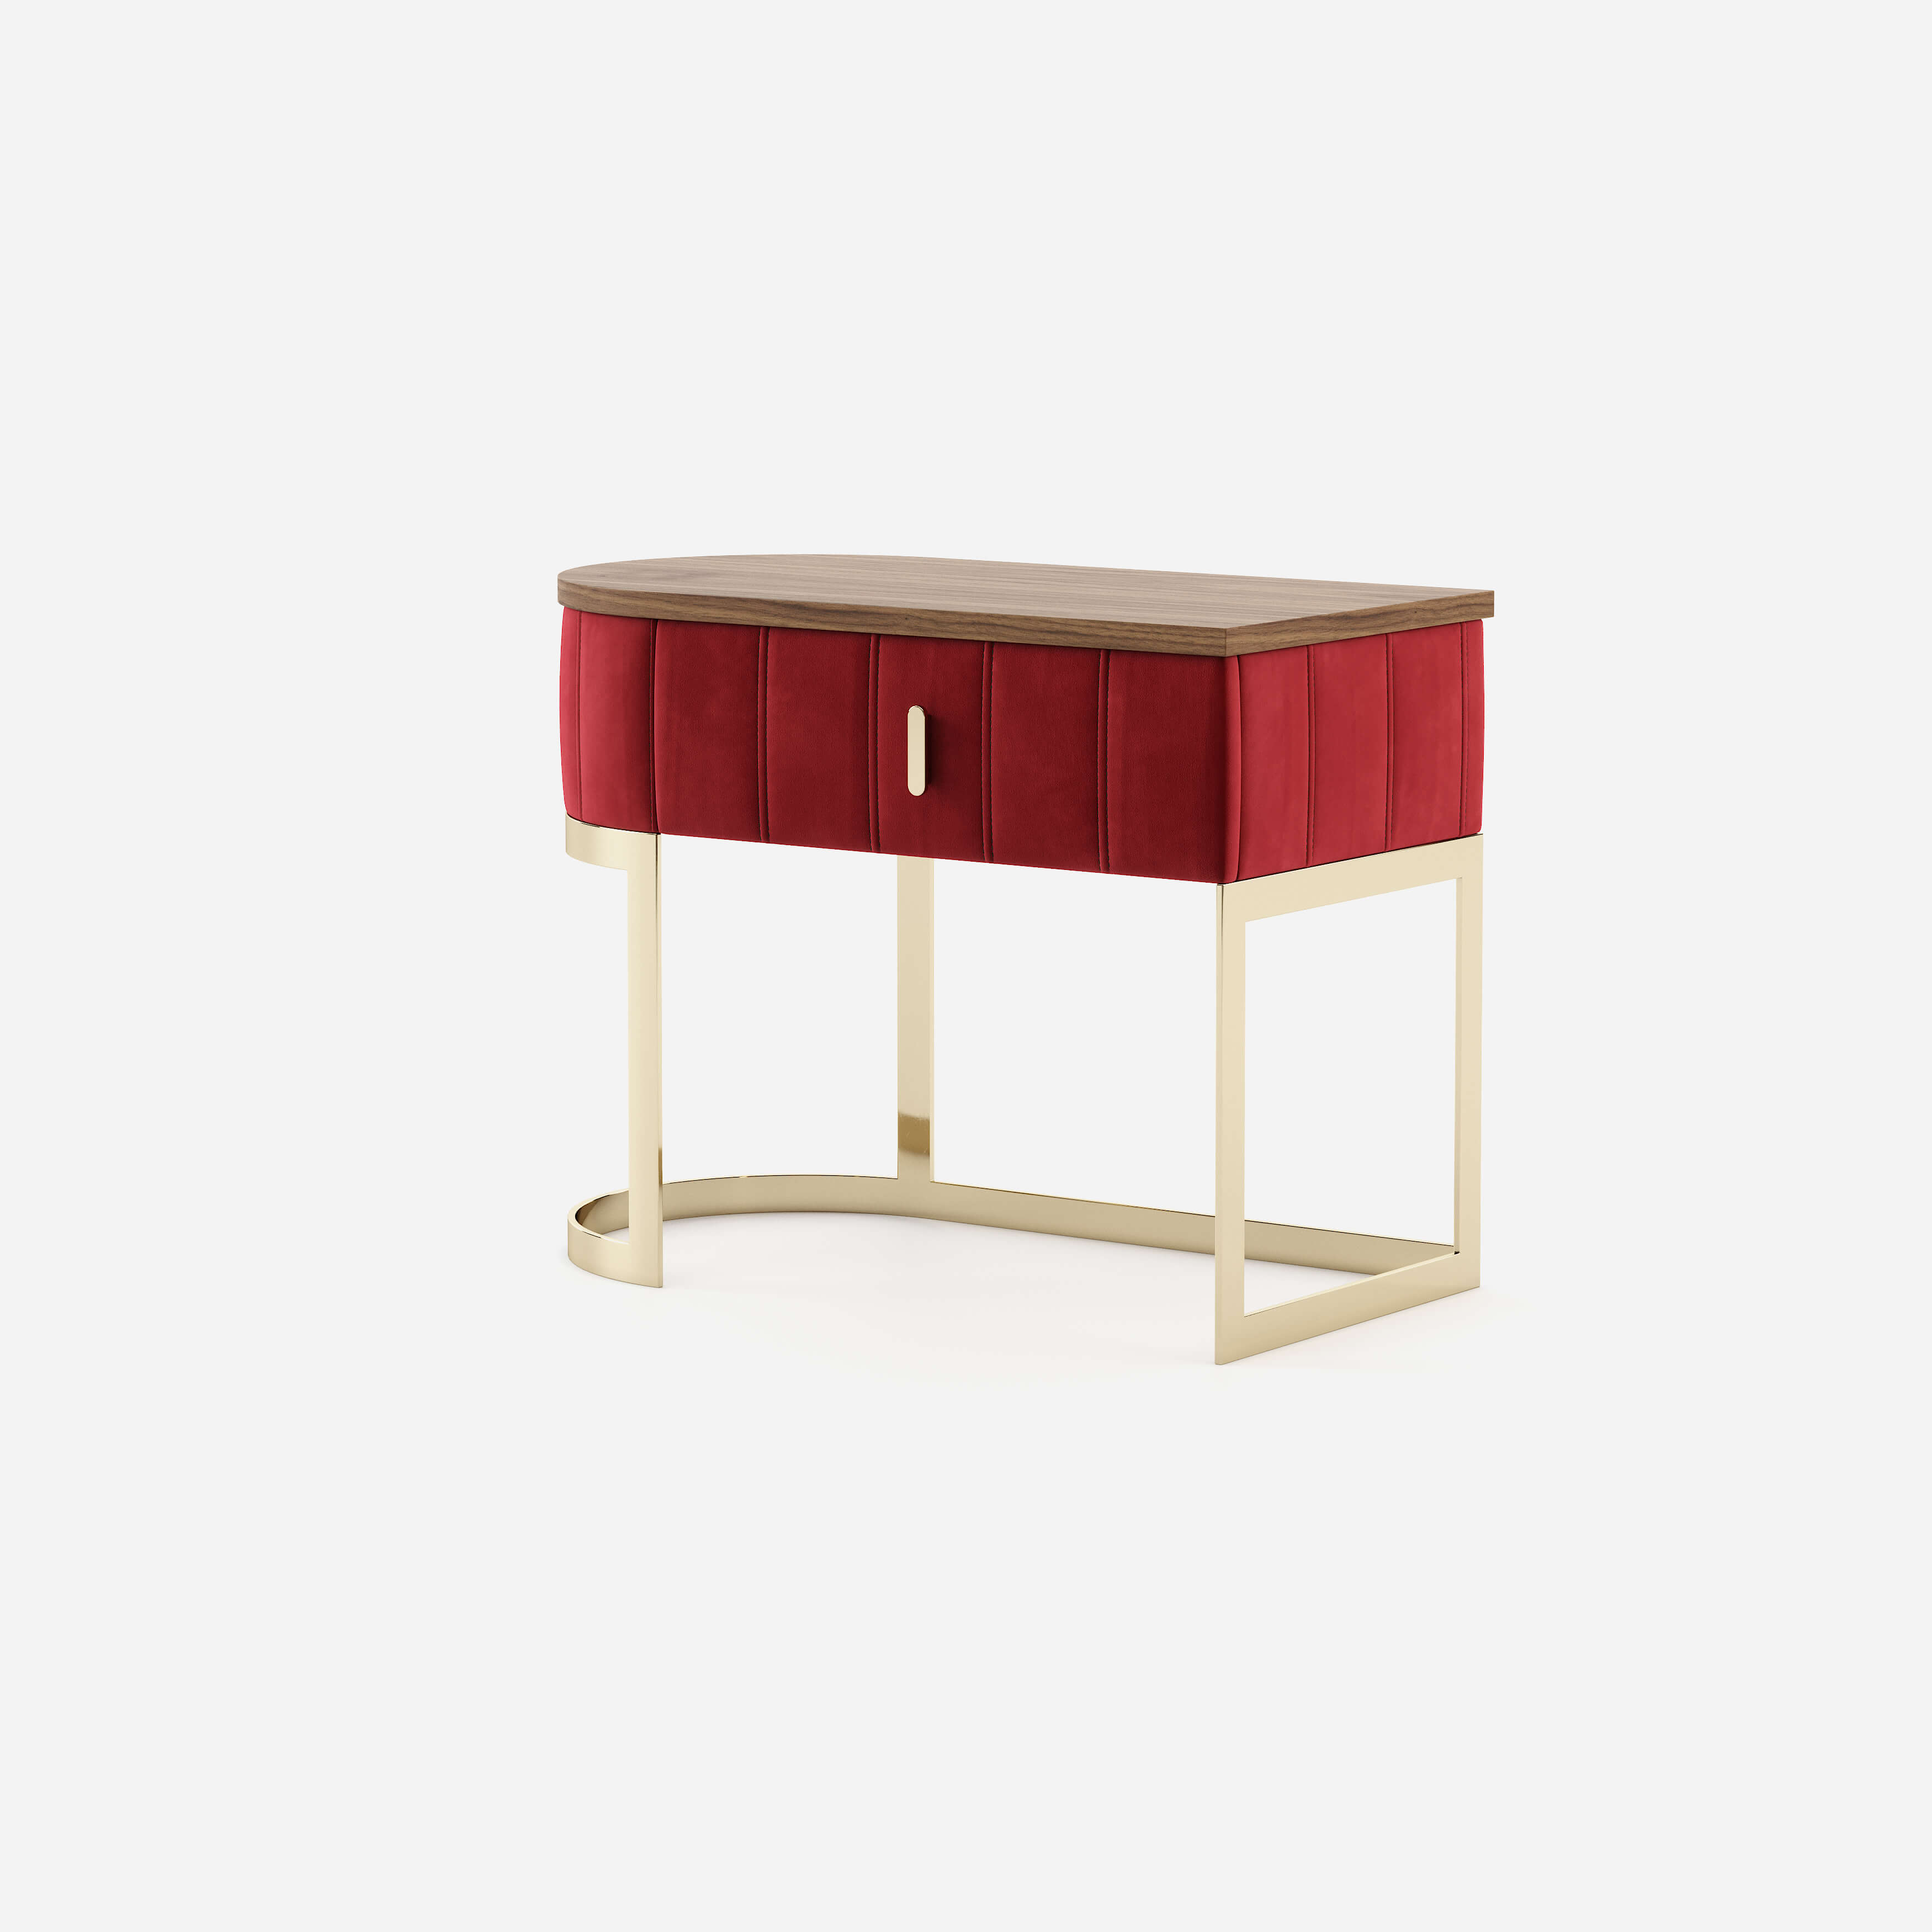 scarlet-bedroom-sidetable-master-bedroom-interior-design-projects-madeira-veludo-metal-1